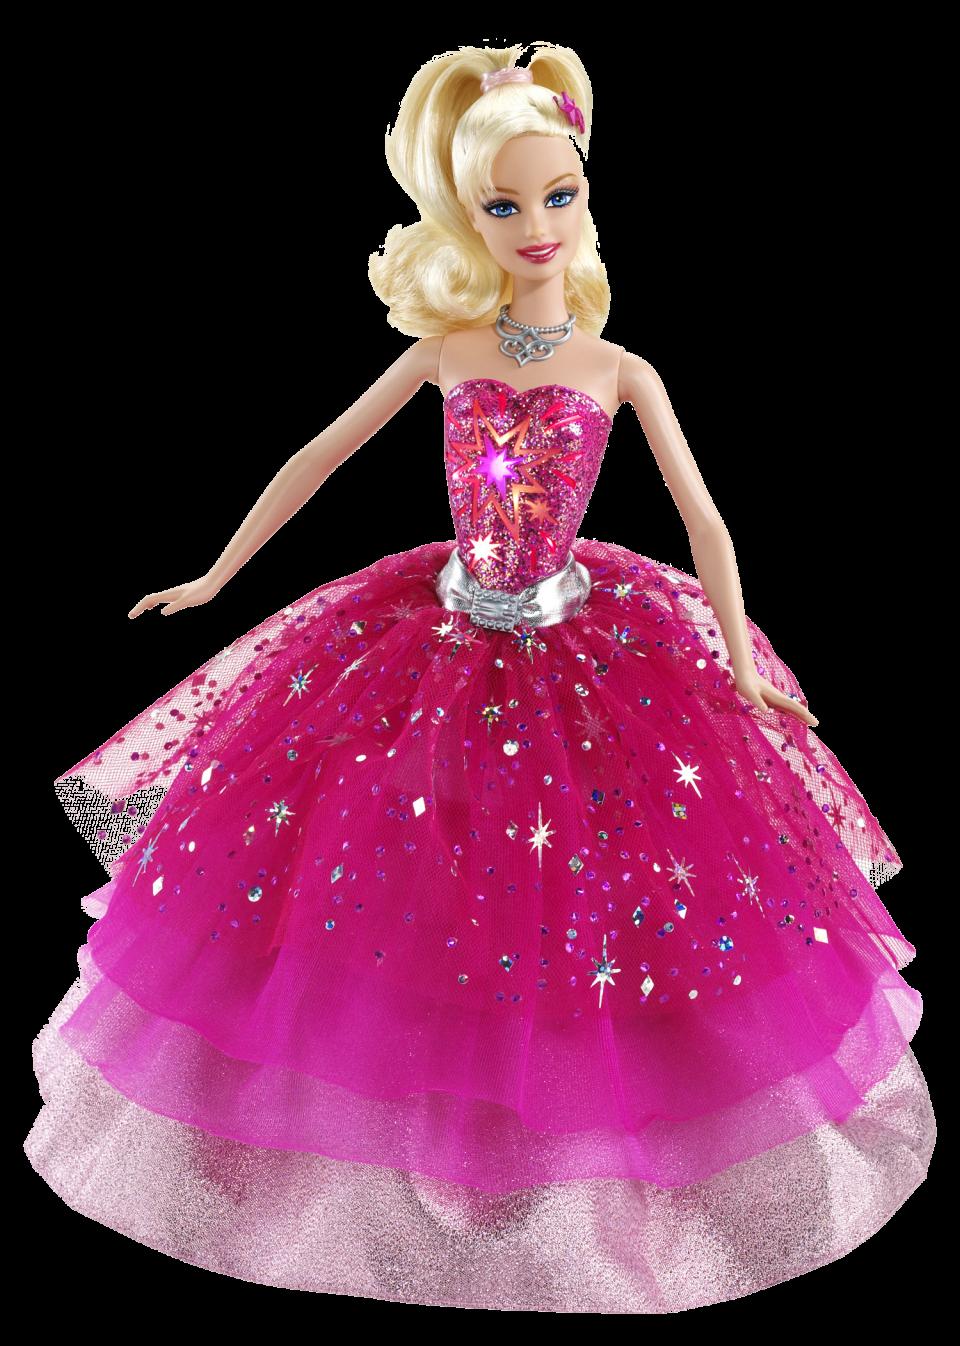 Barbie  Doll PNG Image